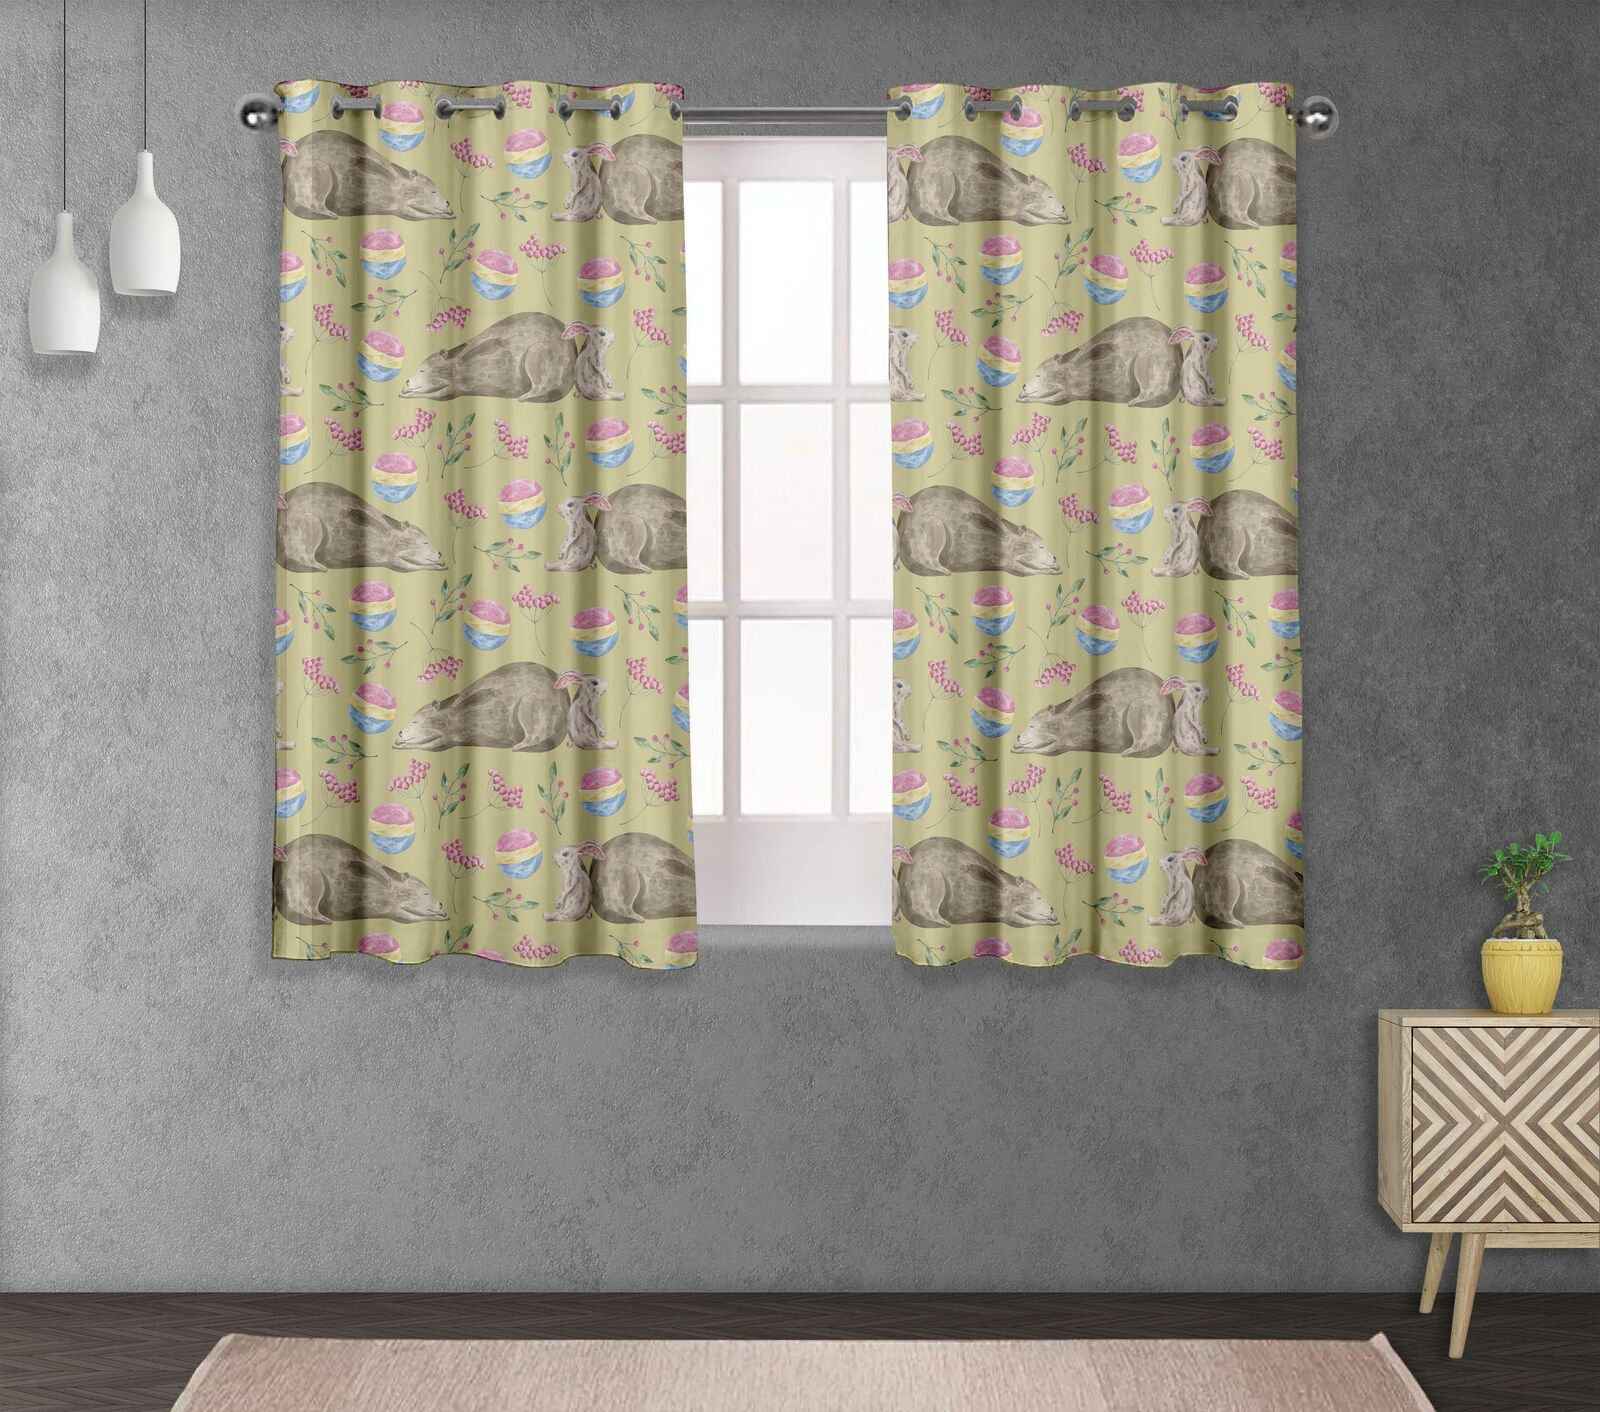 S4sassy Bear & Rabbit Home Decorative short & long Curtain Eyelet Panel -AN-523M